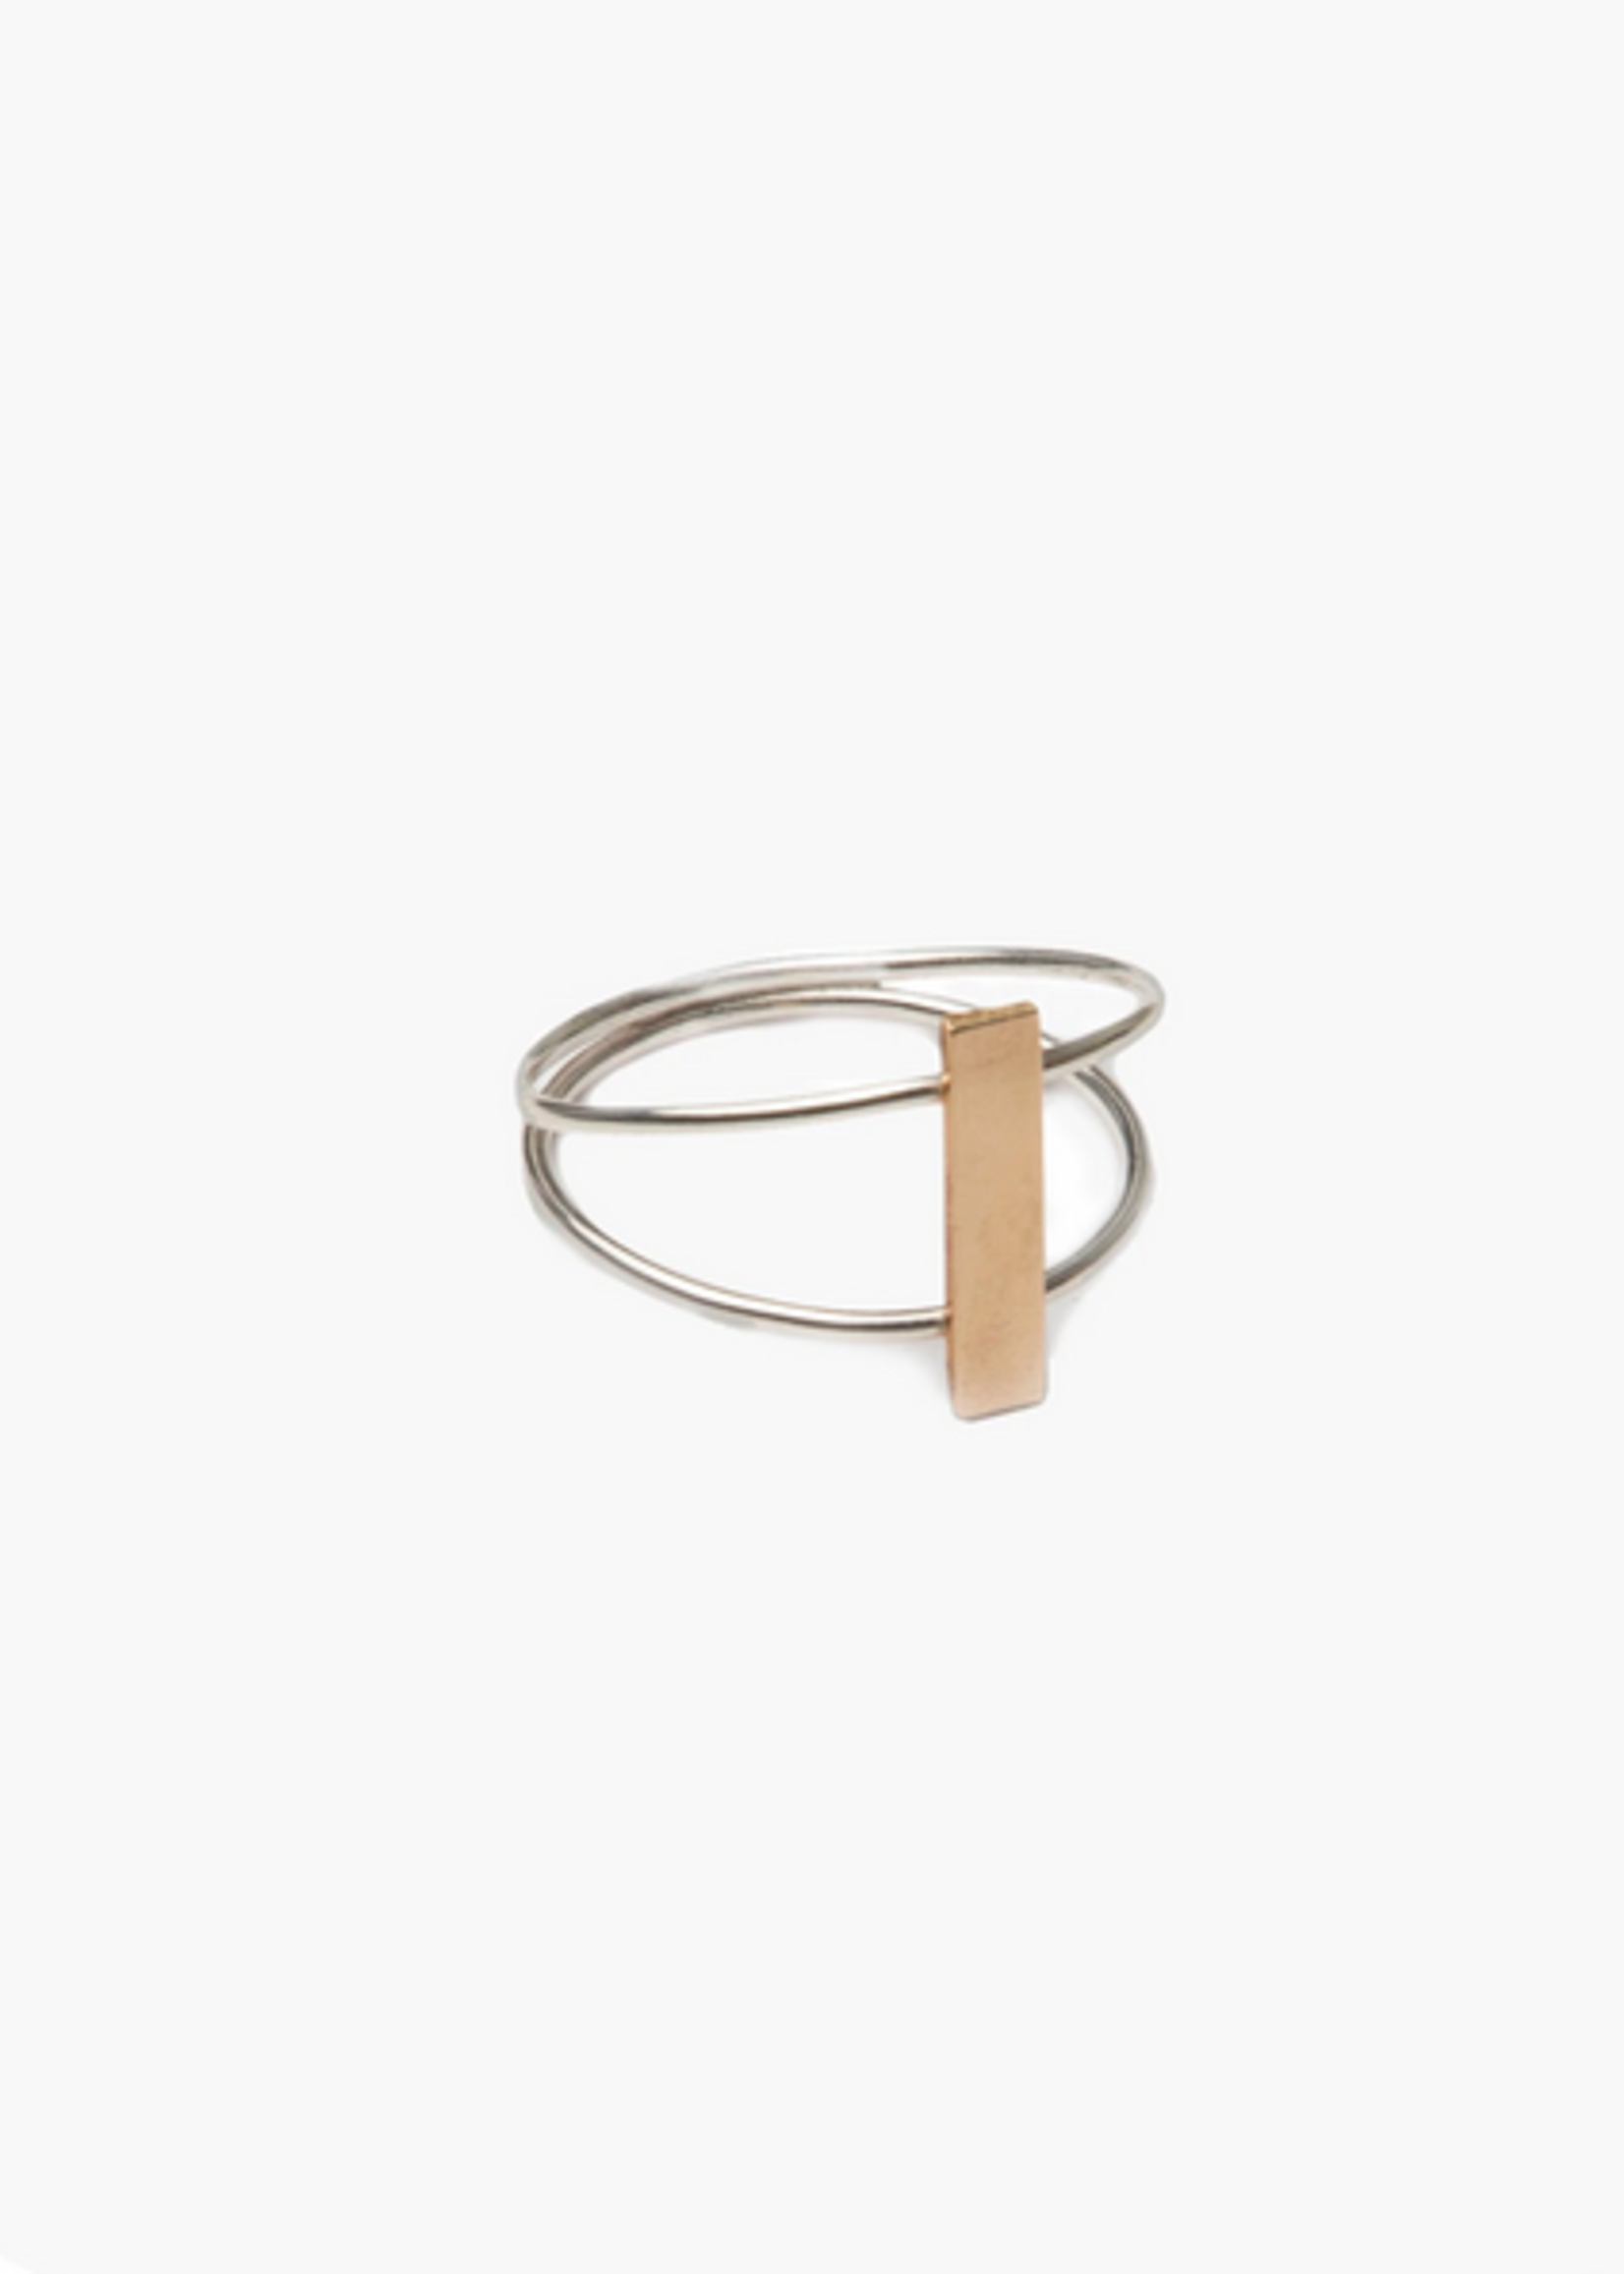 Elitaire Boutique Bridge Ring